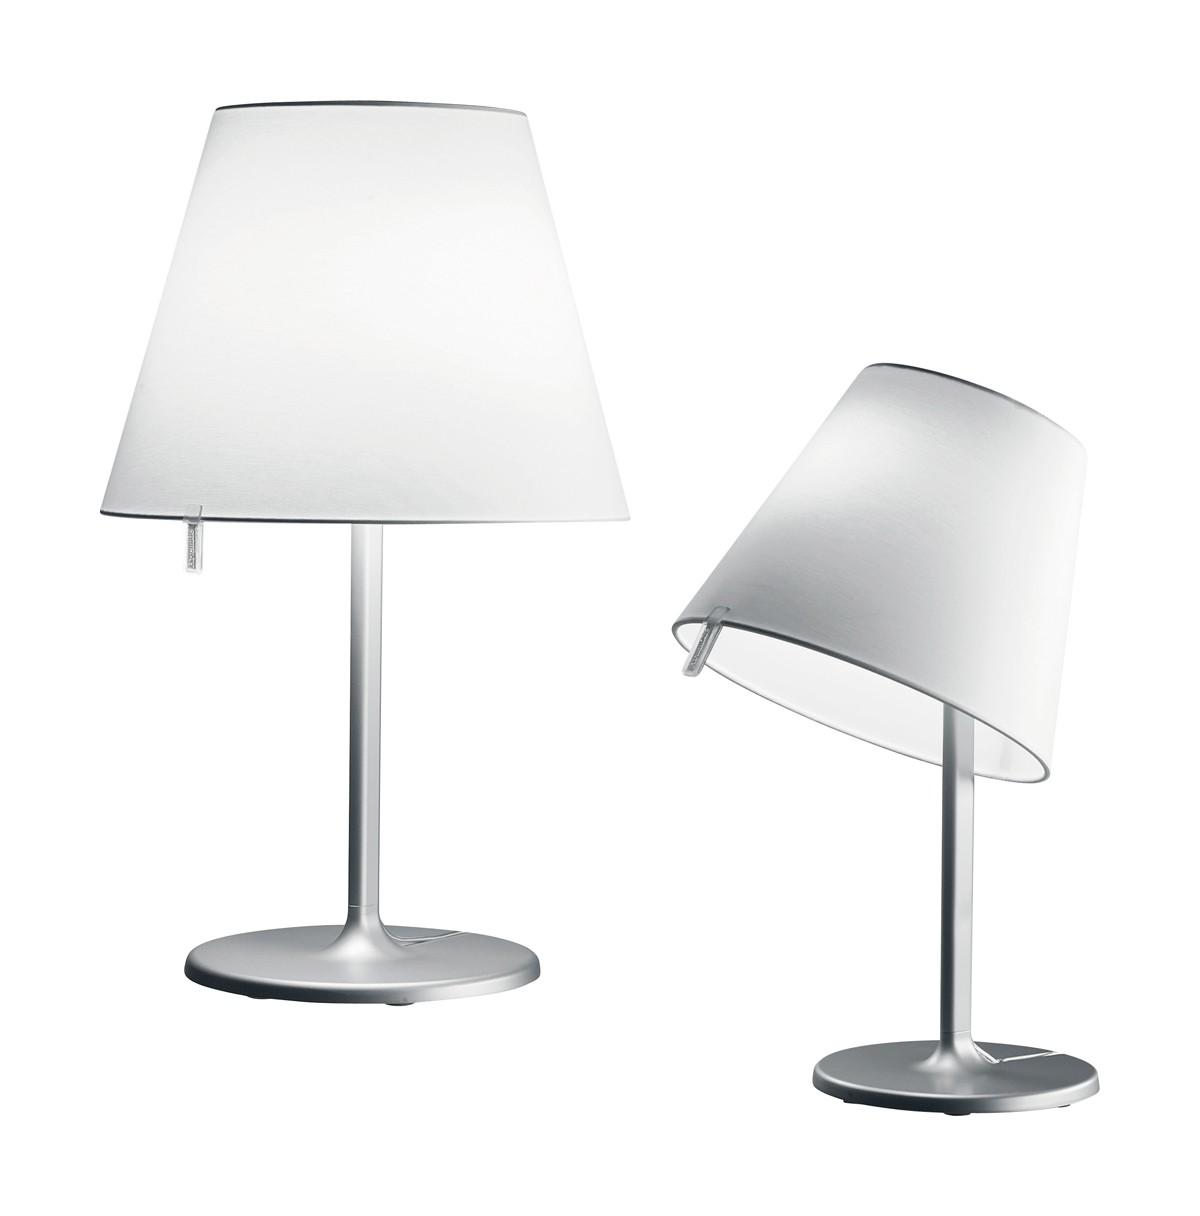 artemide lampadaire lampe melampo tavalo duartemide. Black Bedroom Furniture Sets. Home Design Ideas